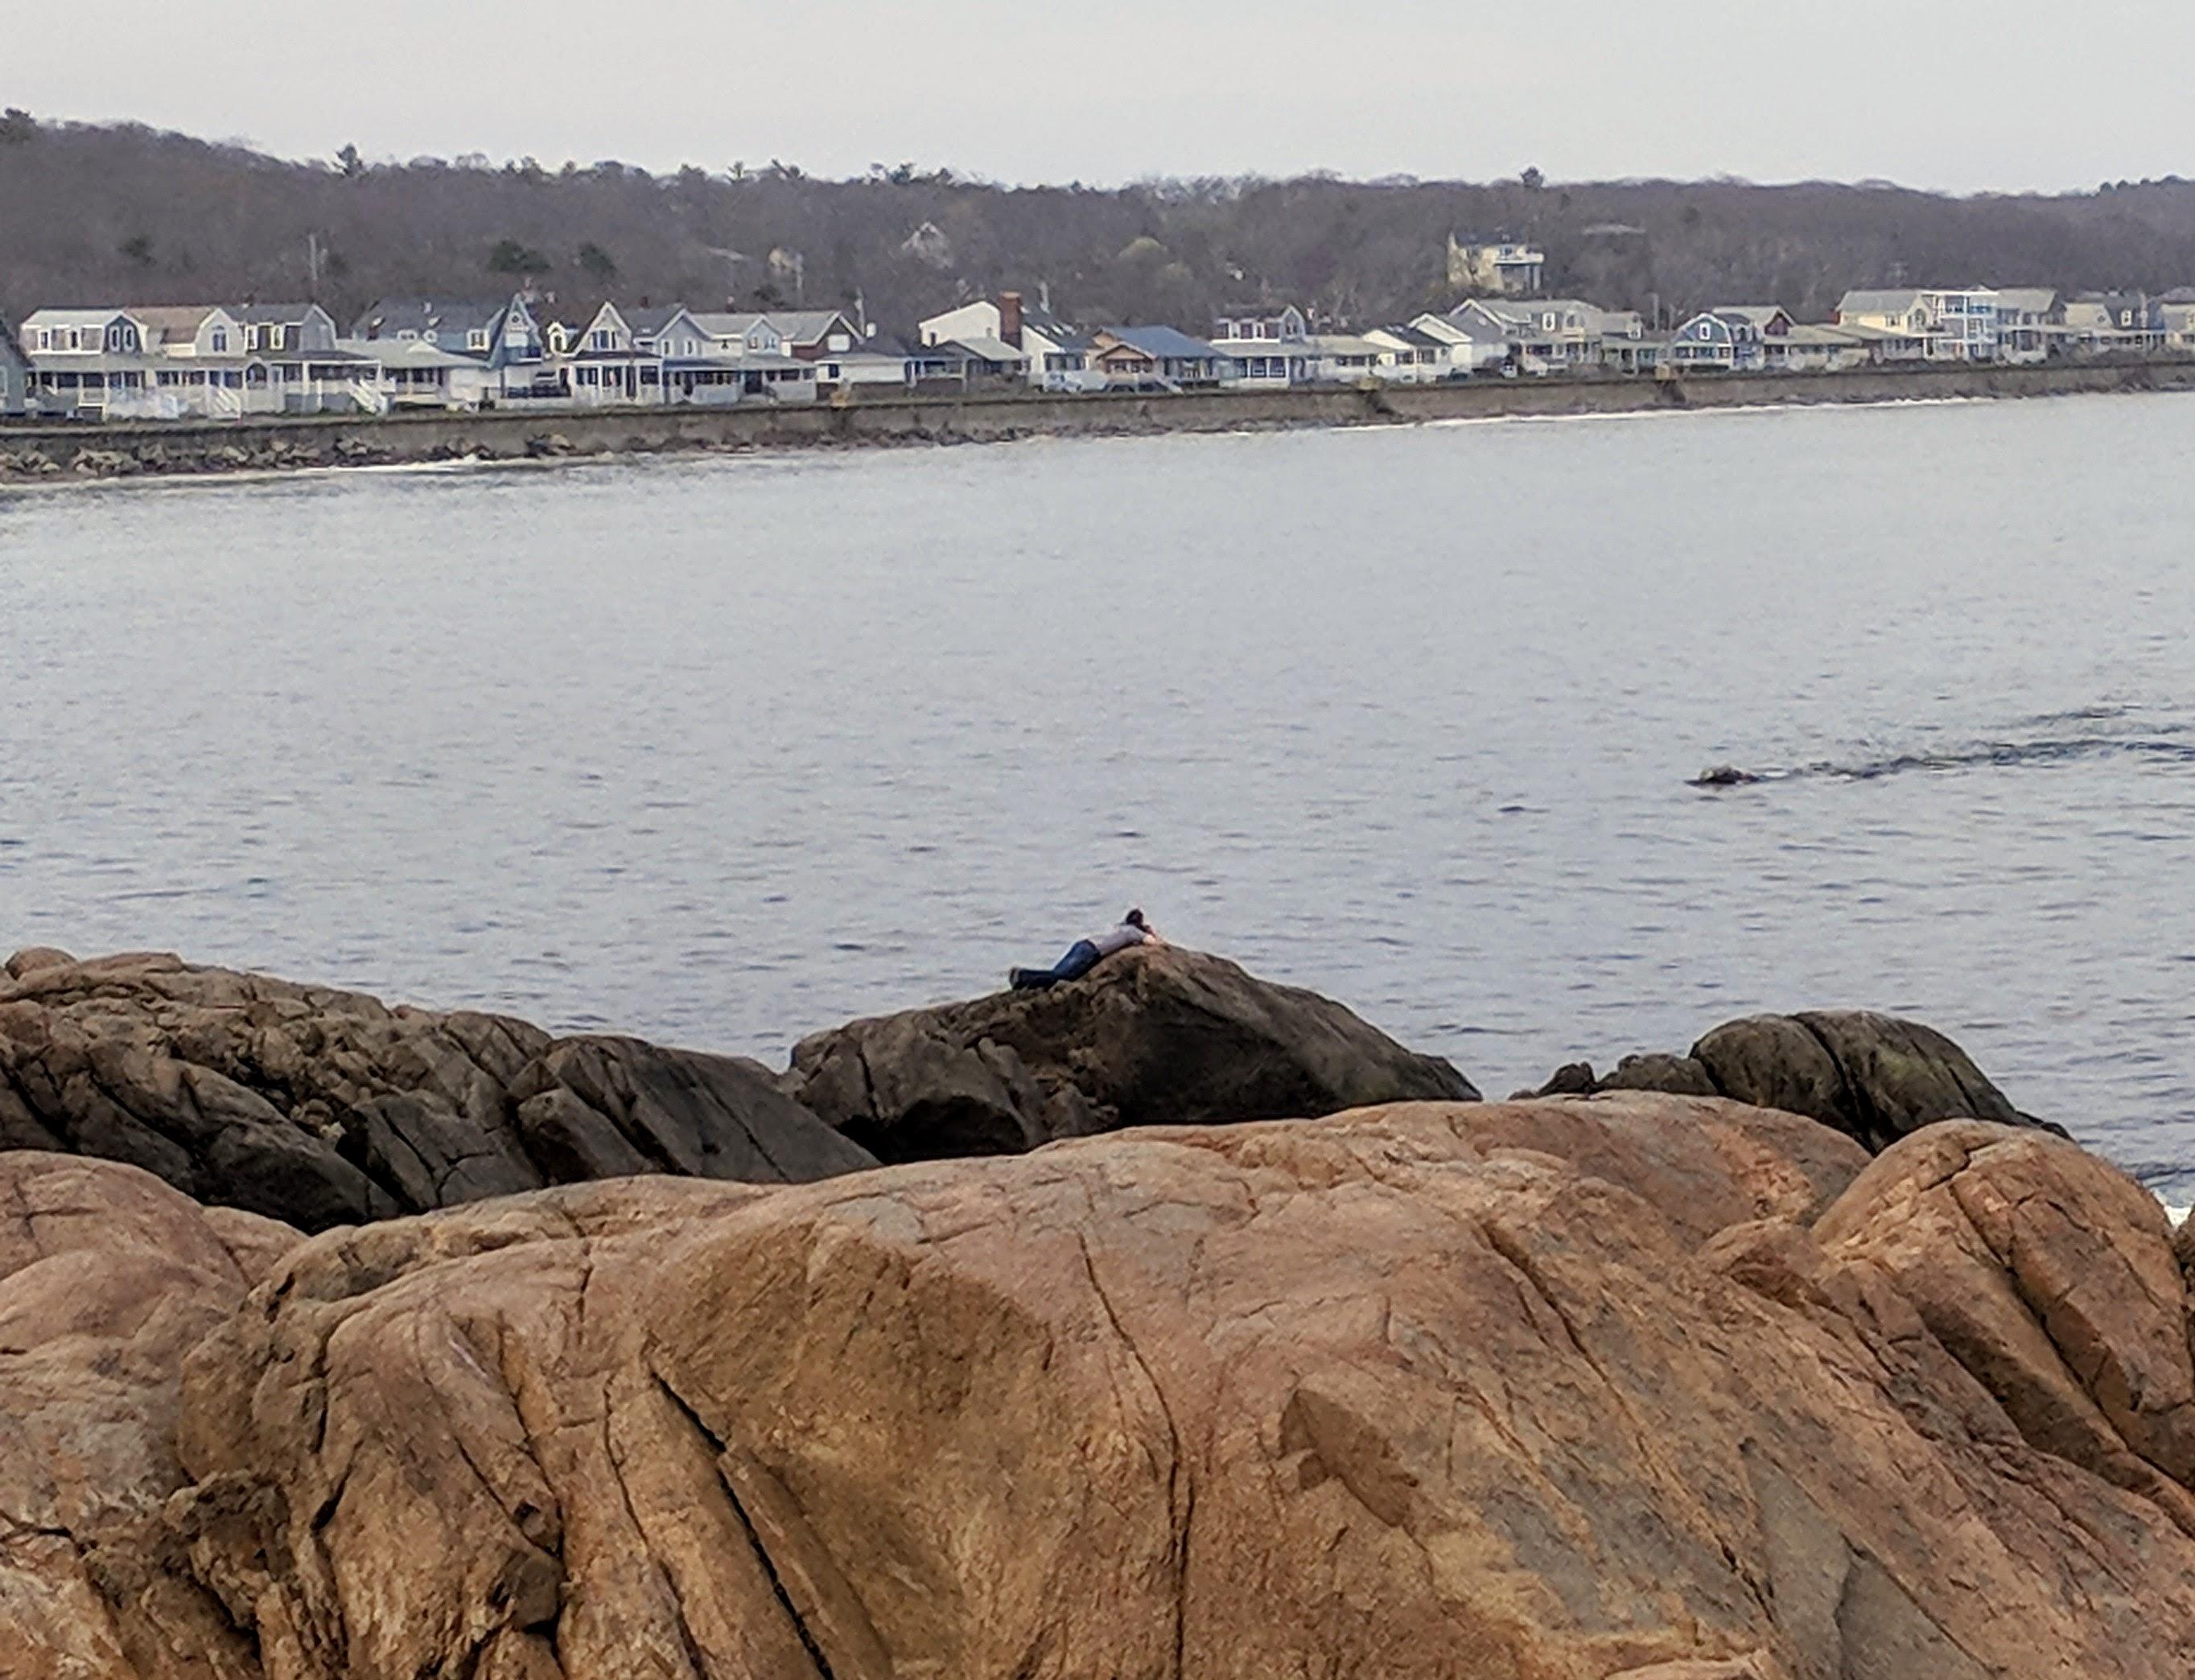 Senator Bruce Tarr, lobster fishery, right whales, patrol boats,